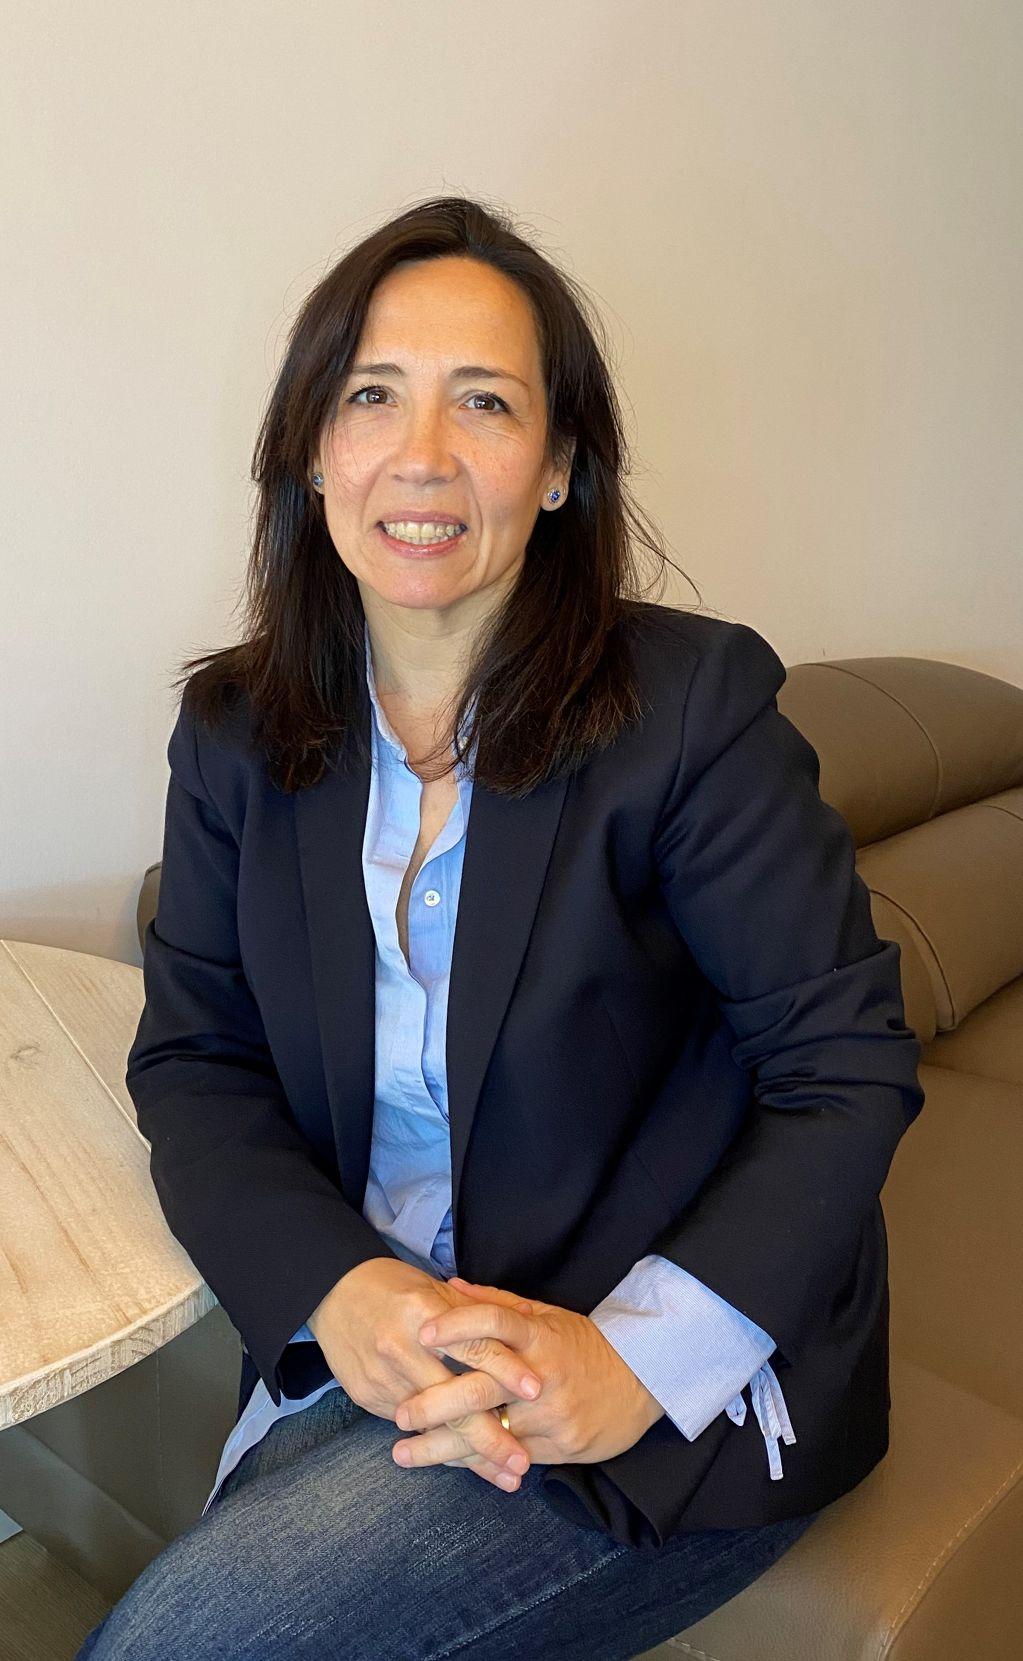 Sandra Margenats